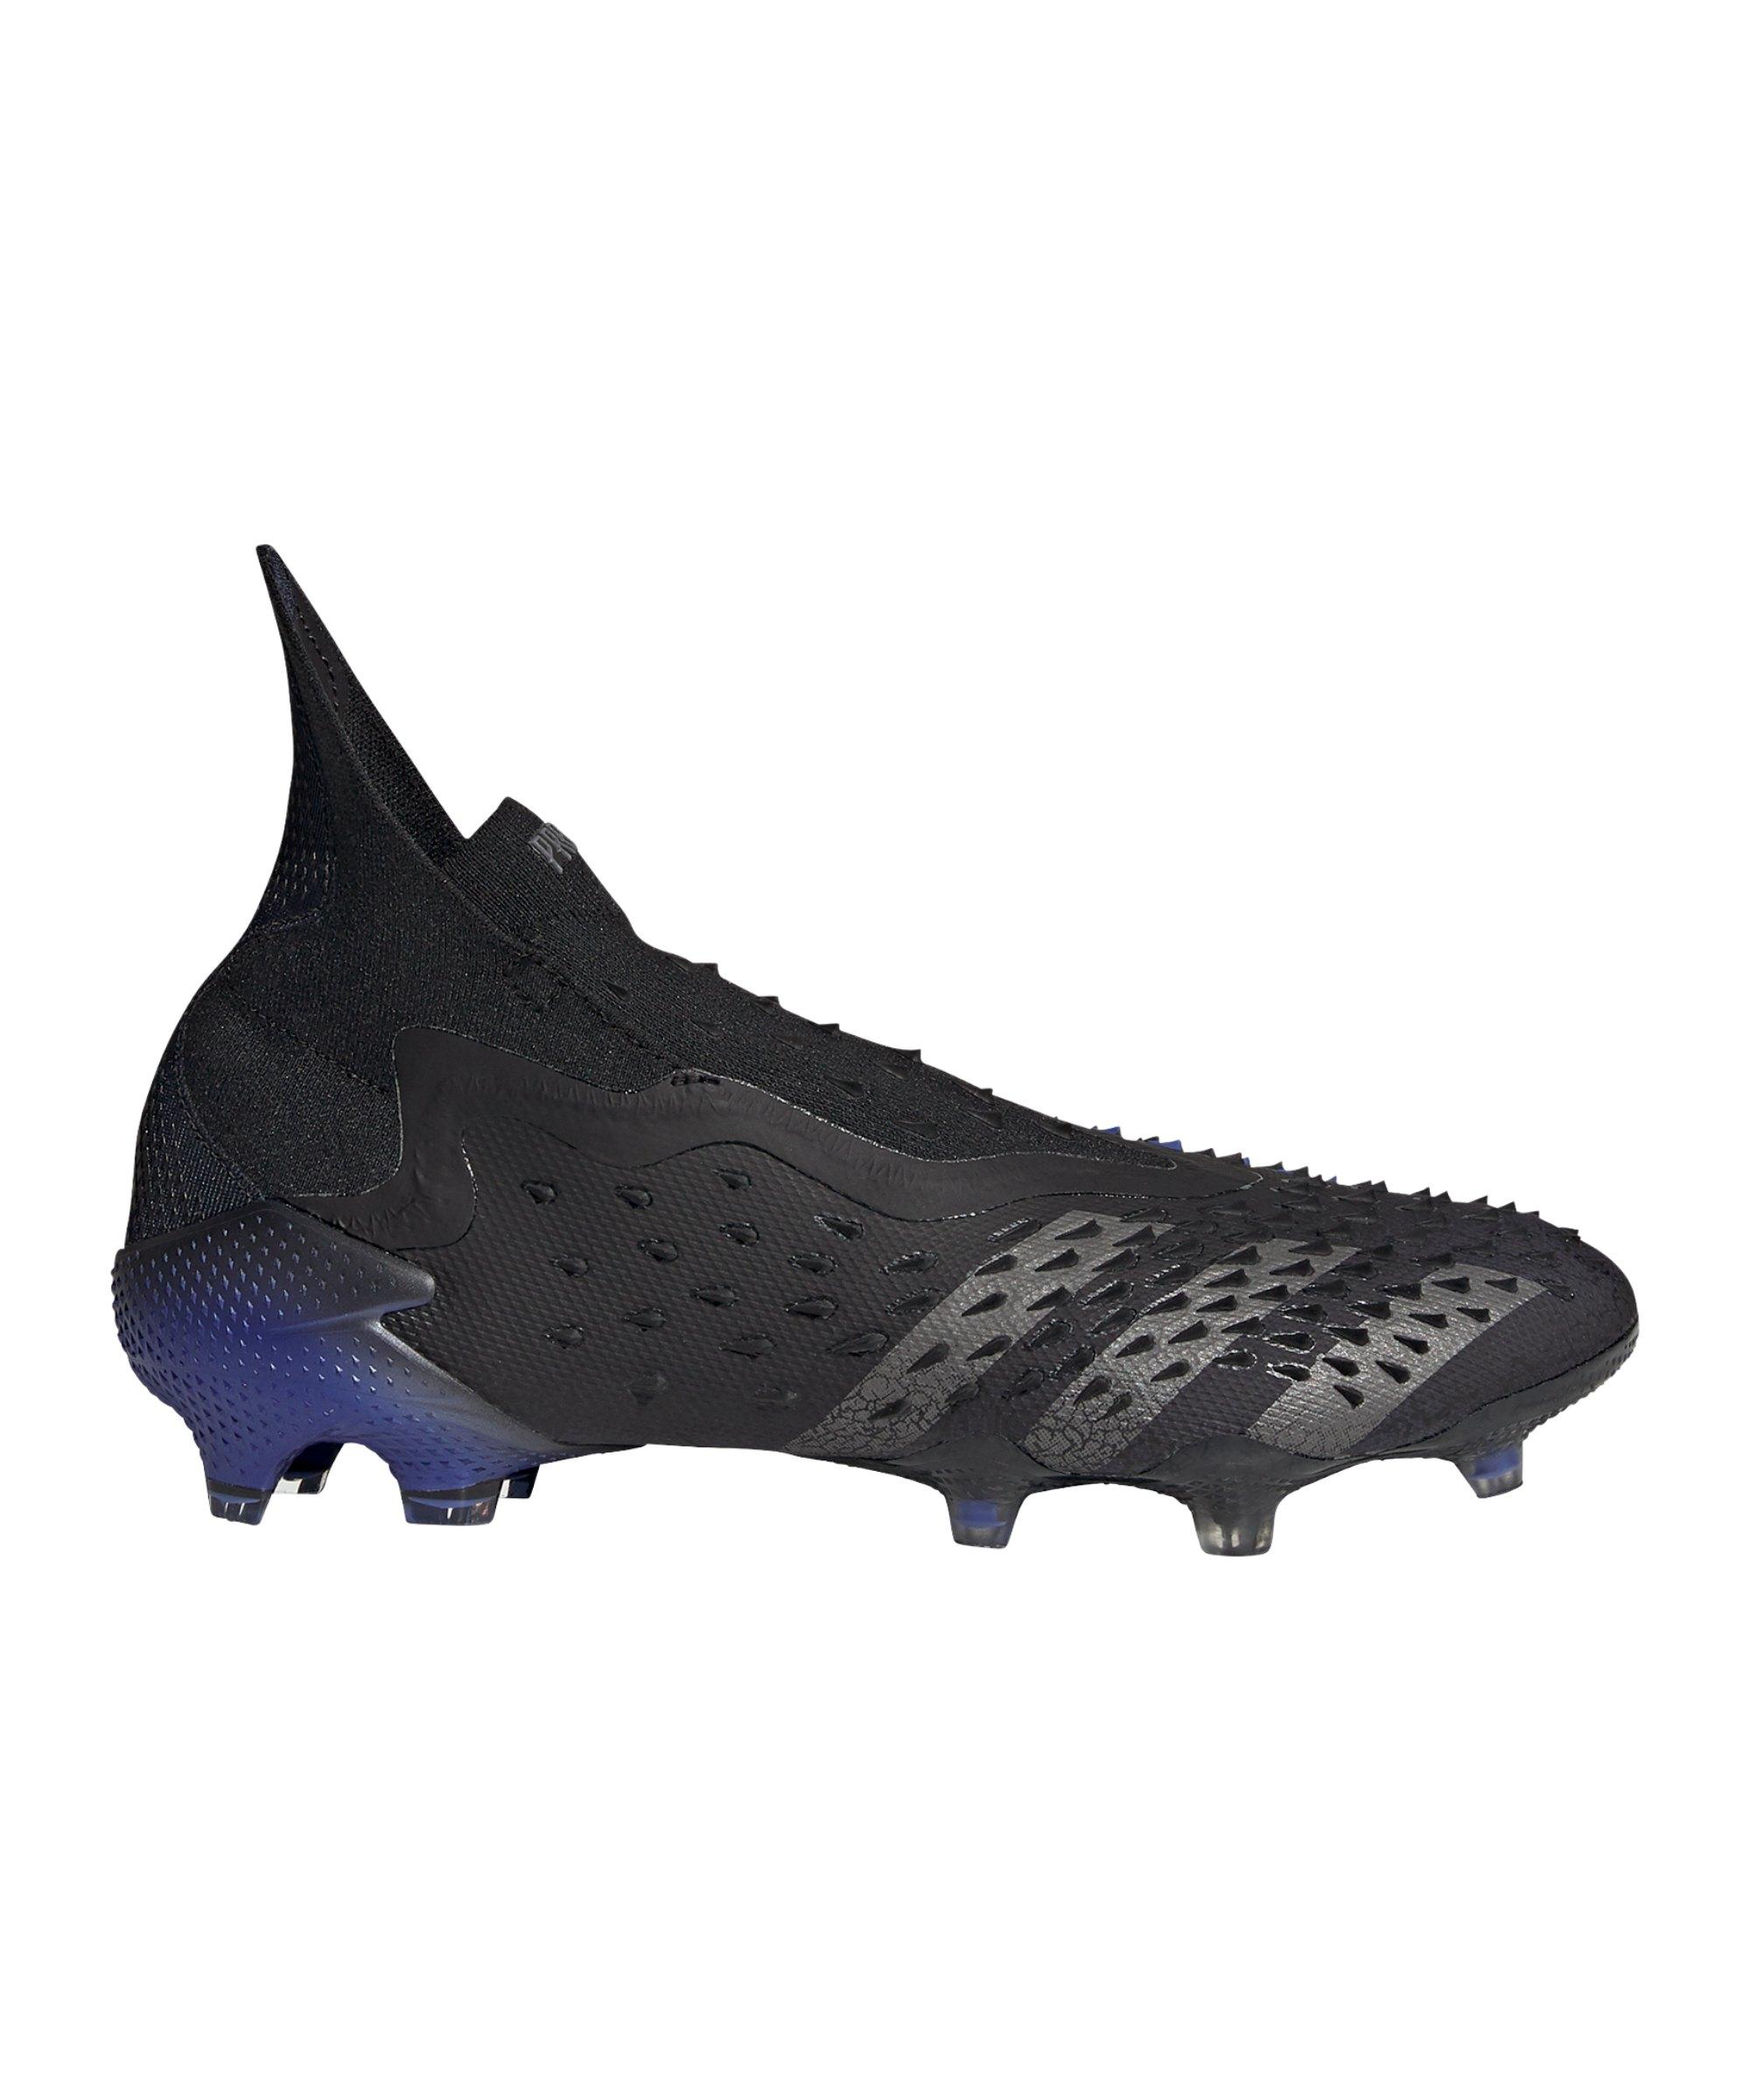 adidas Predator FREAK+ FG Escapelight Schwarz Blau - schwarz